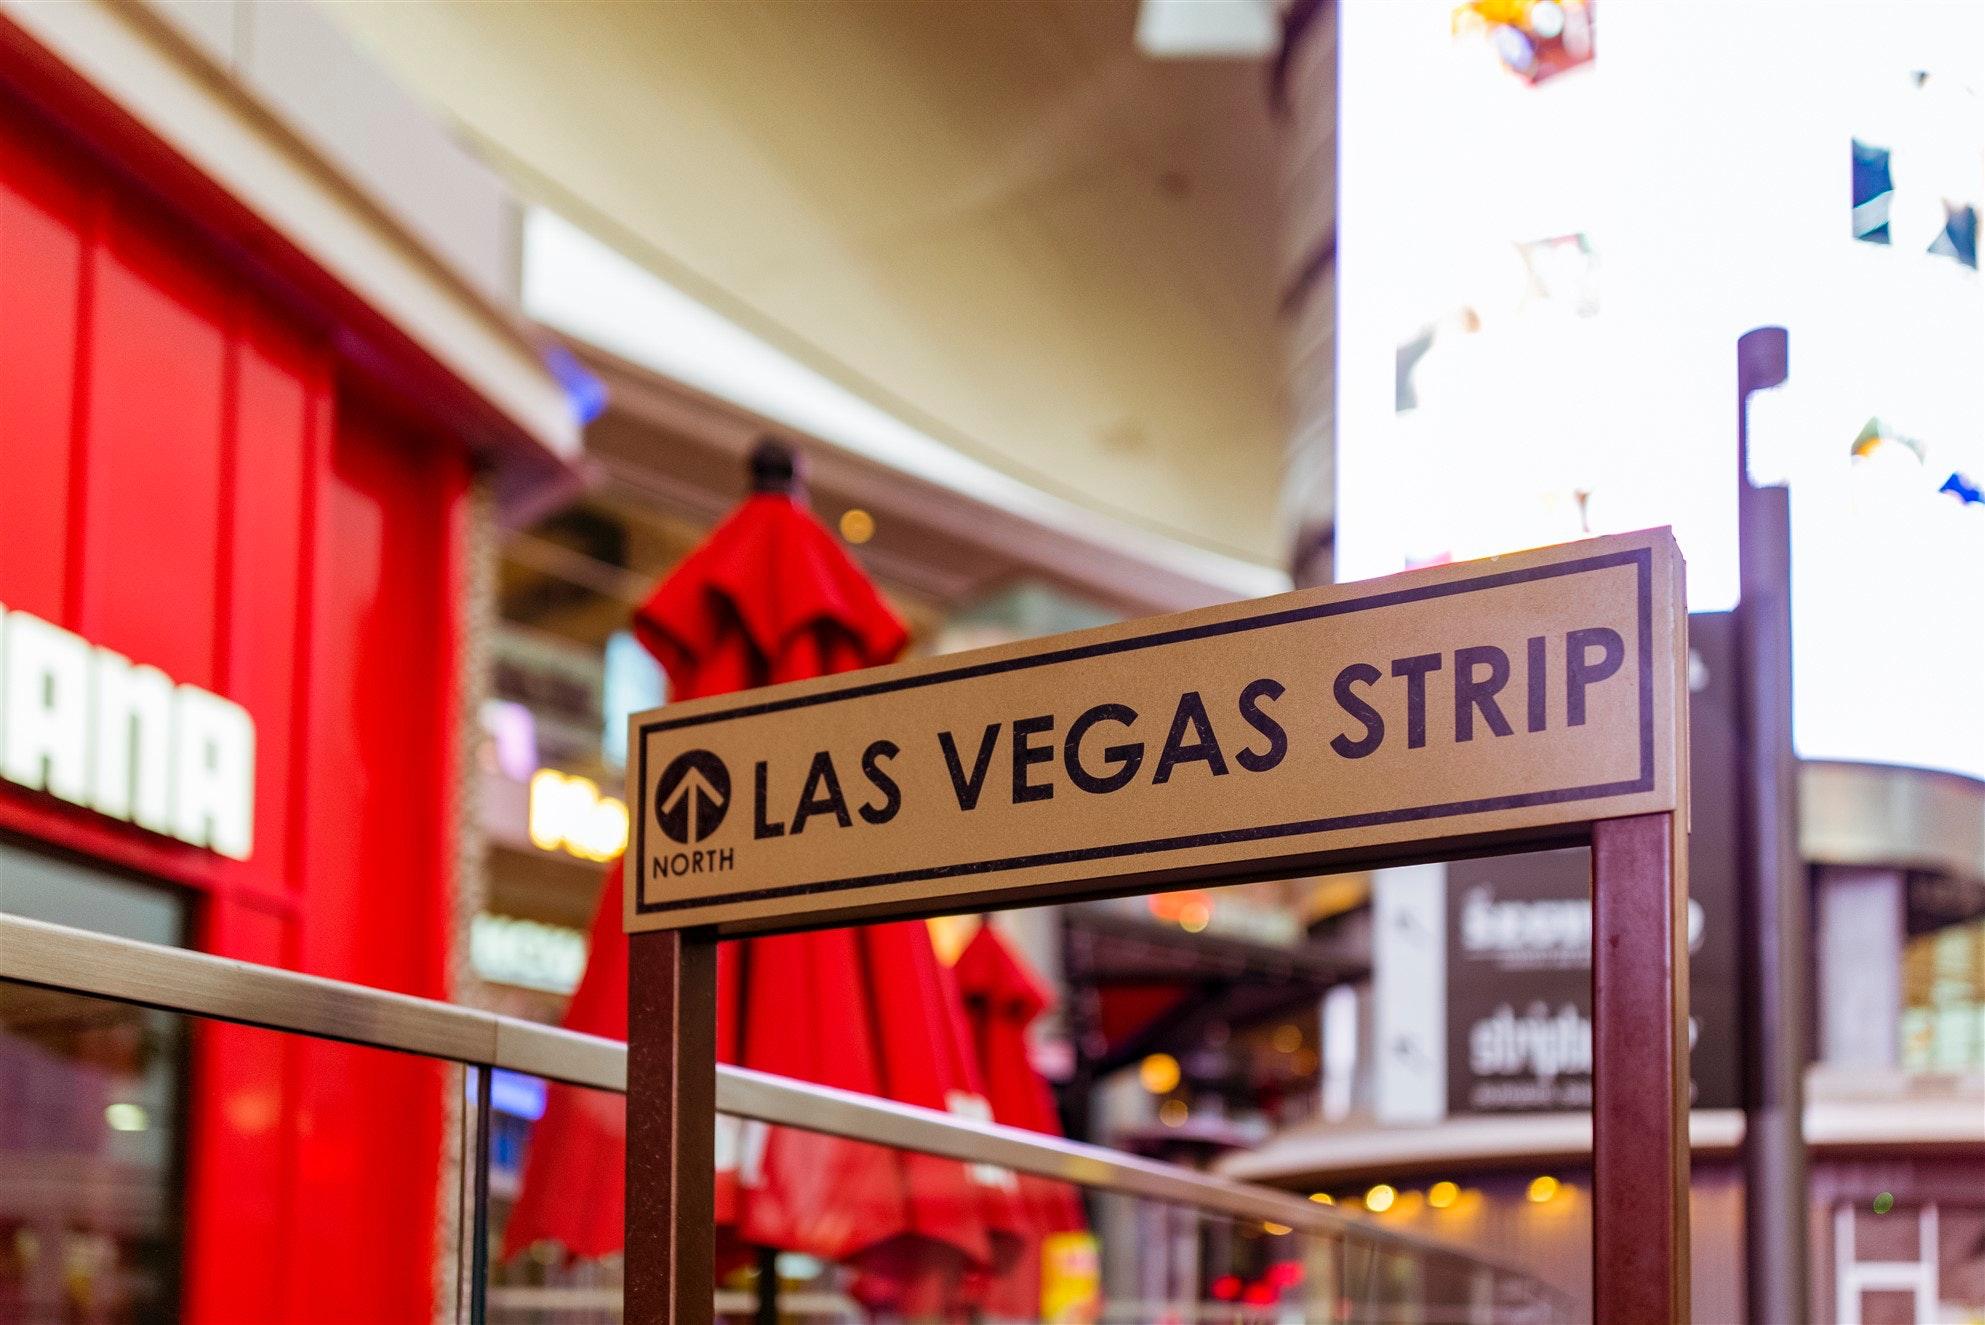 Las Vegas Strip Signage, Road, Vegas, Usa, Travel, HQ Photo